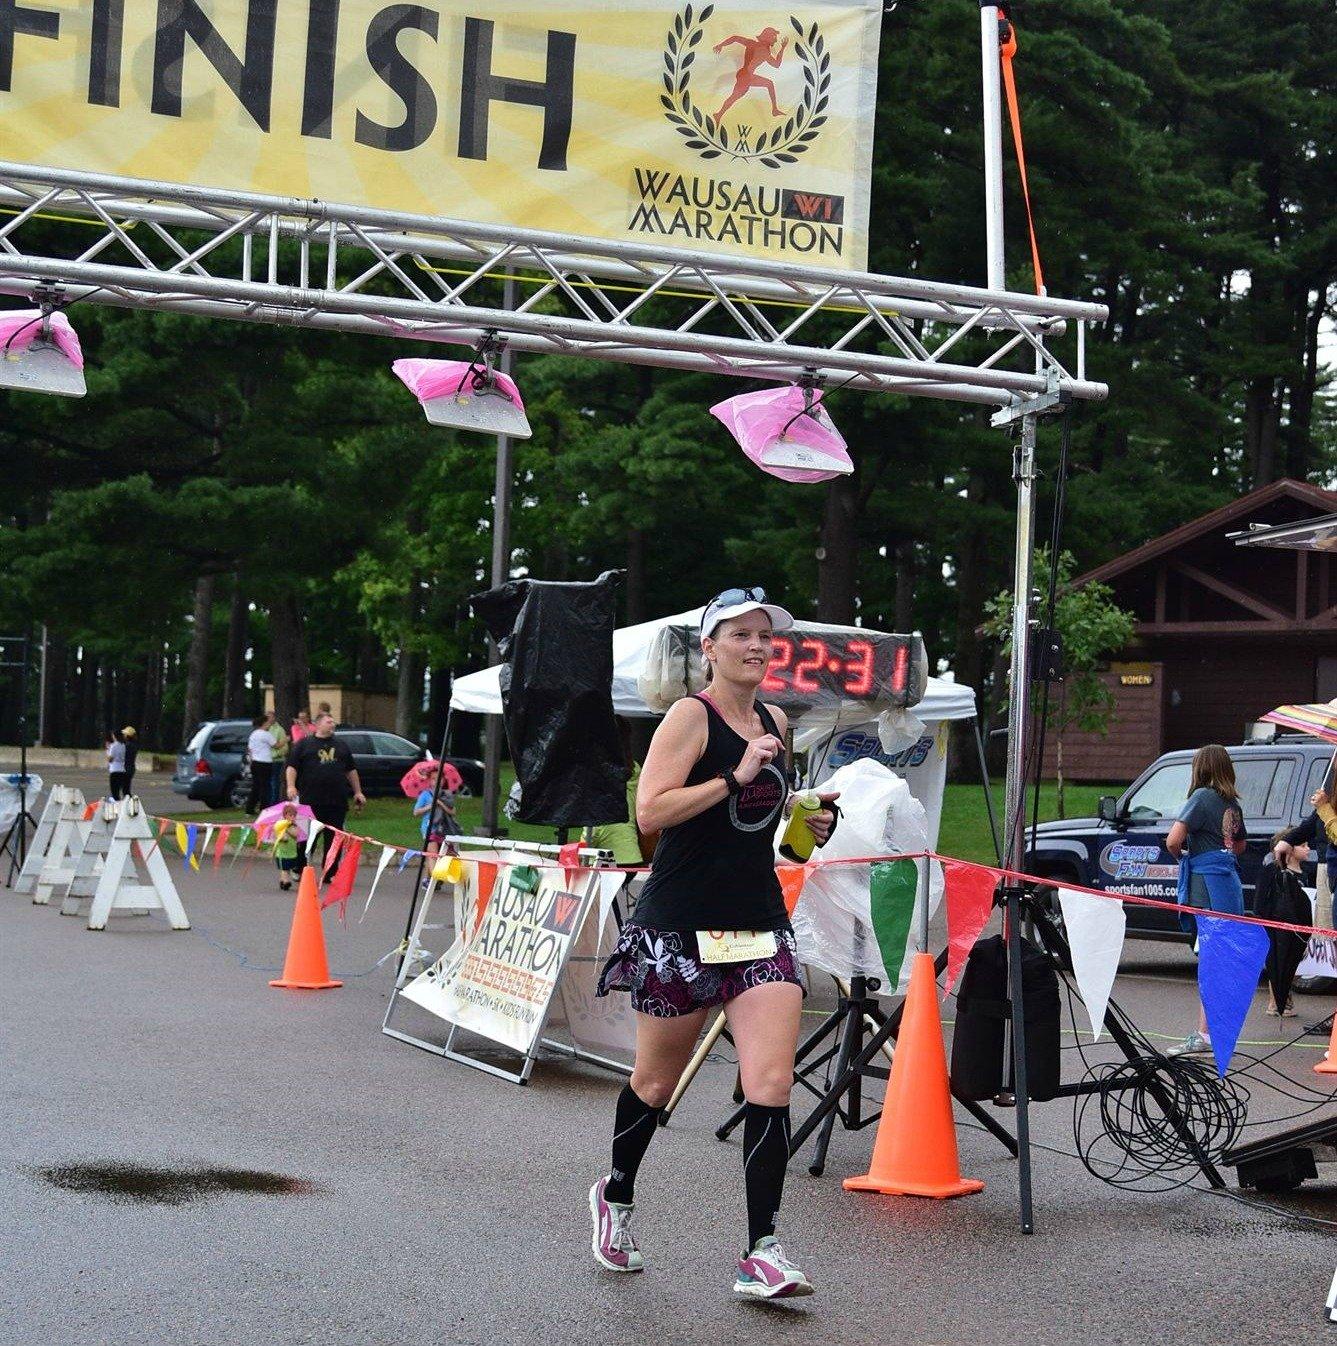 wausau half marathon finish